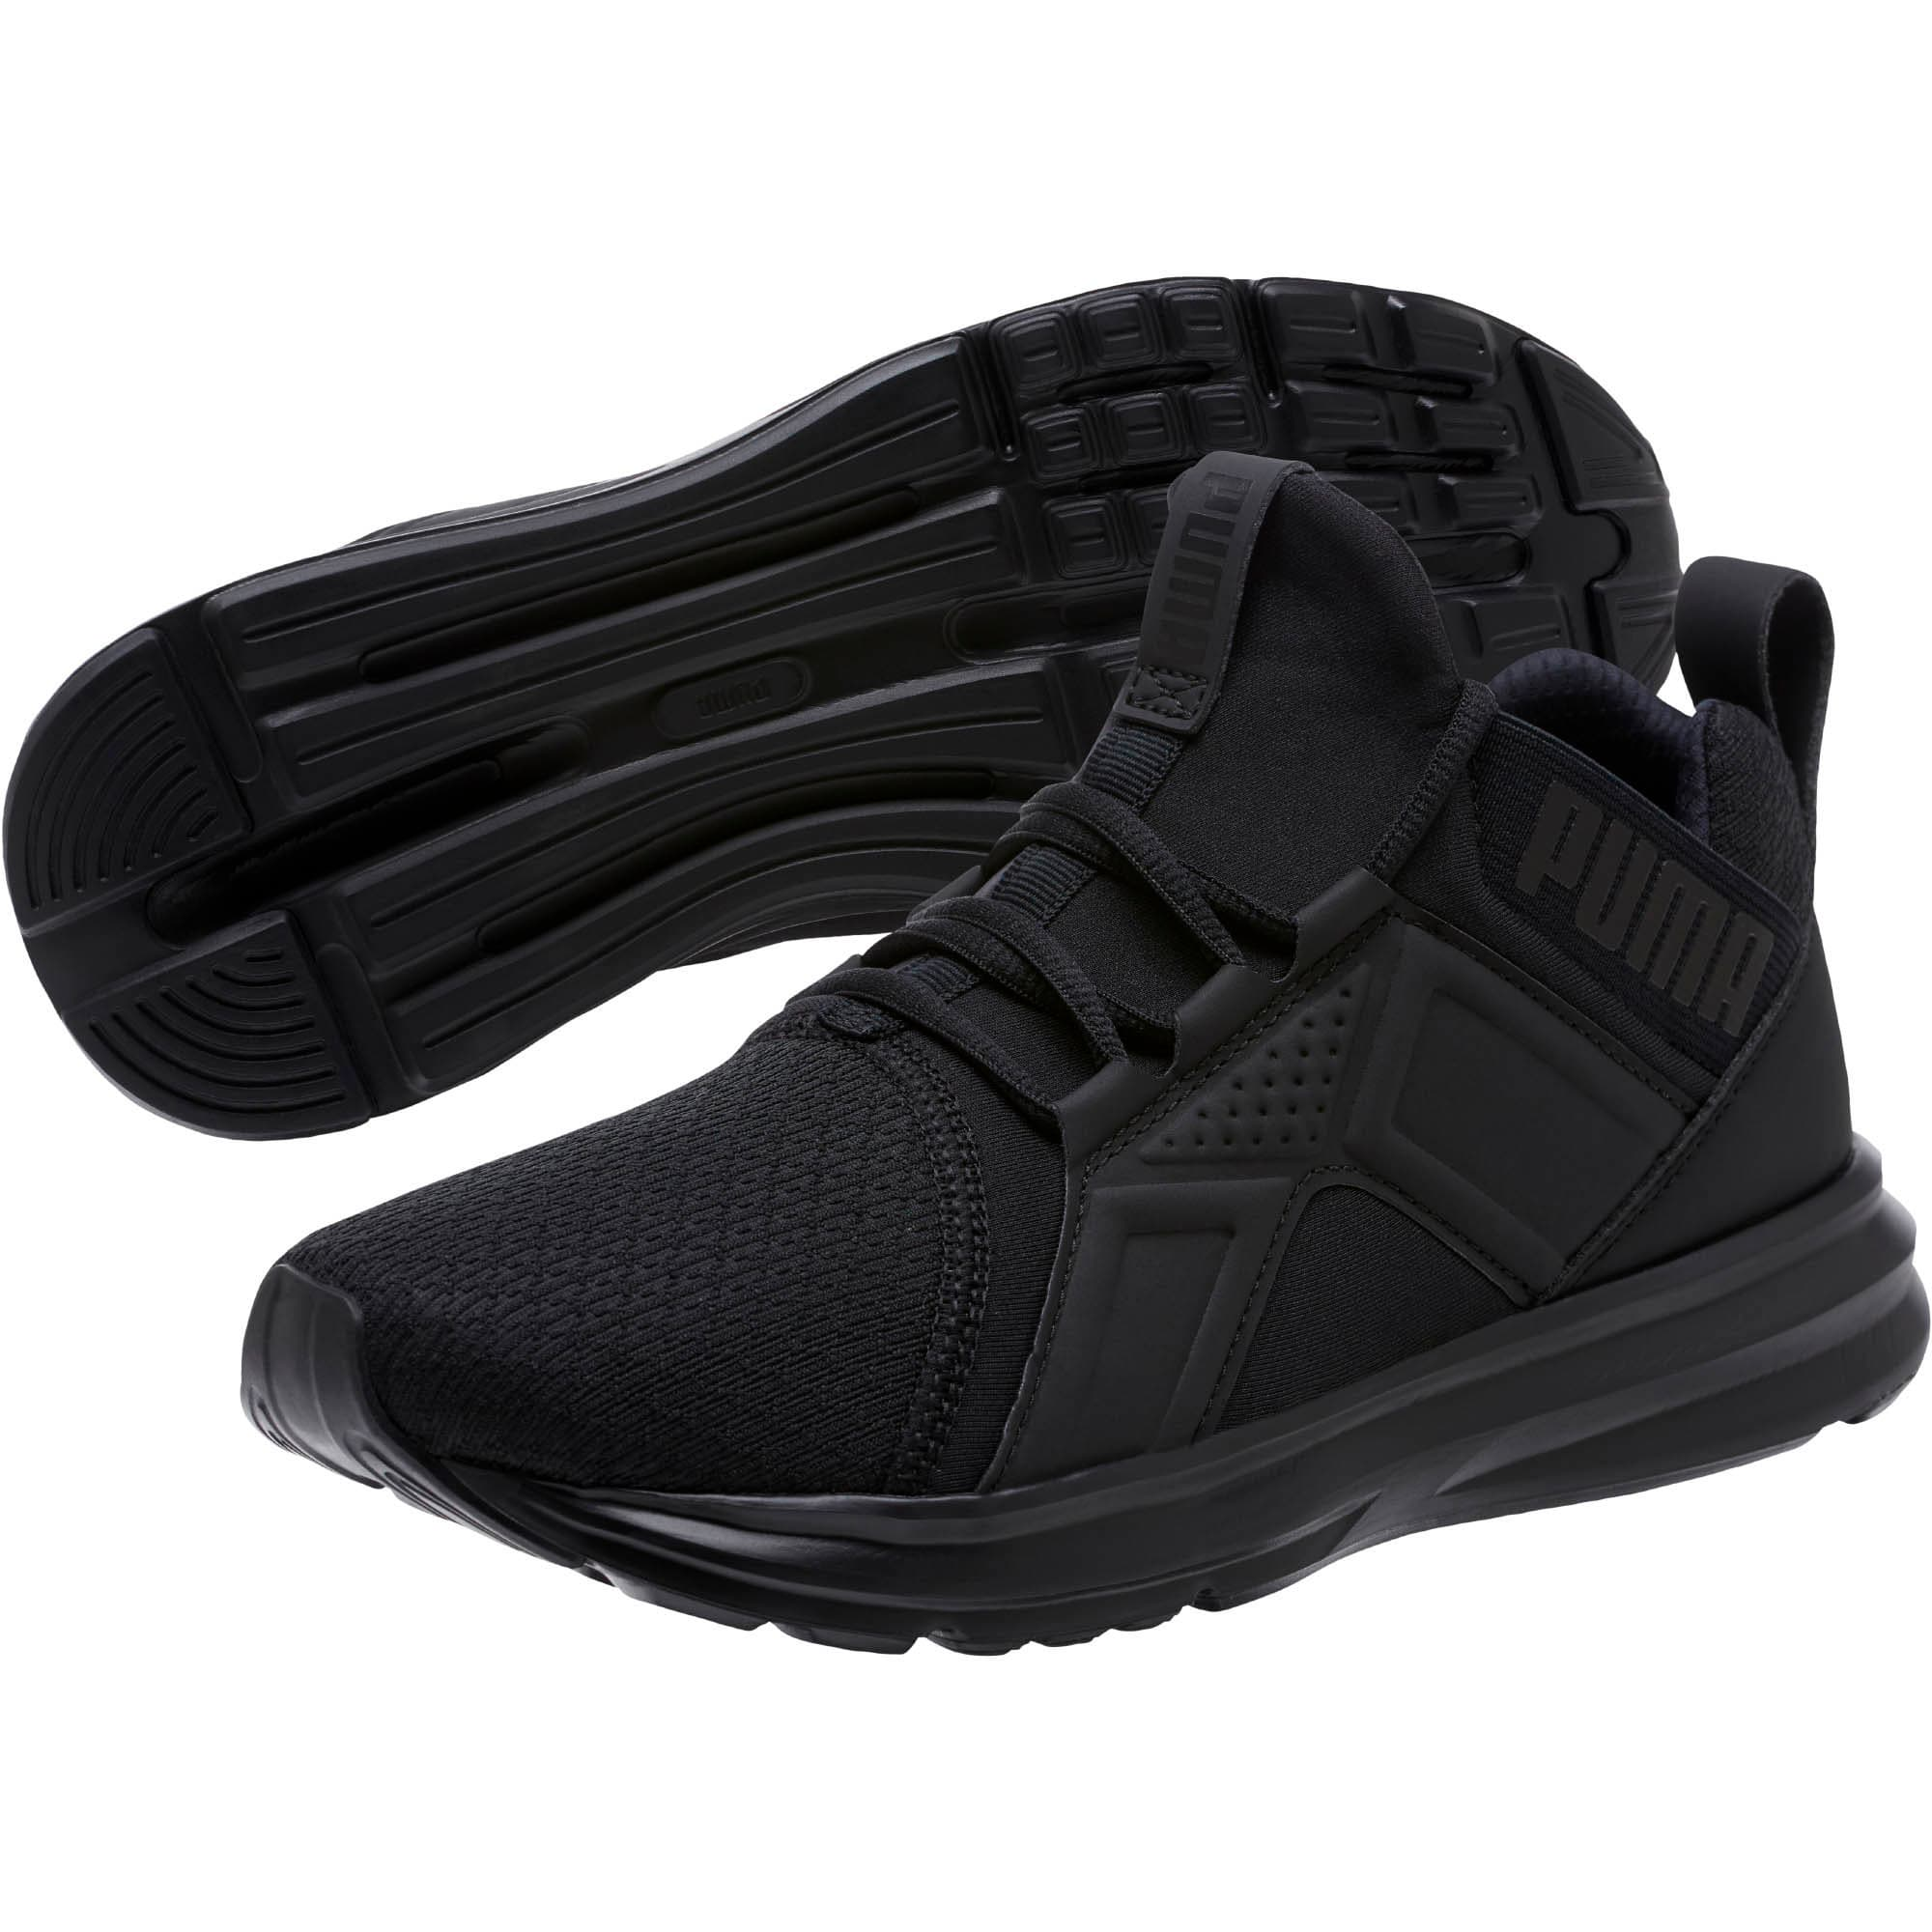 Thumbnail 2 of Zenvo Women's Training Shoes, Puma Black-Puma Black, medium